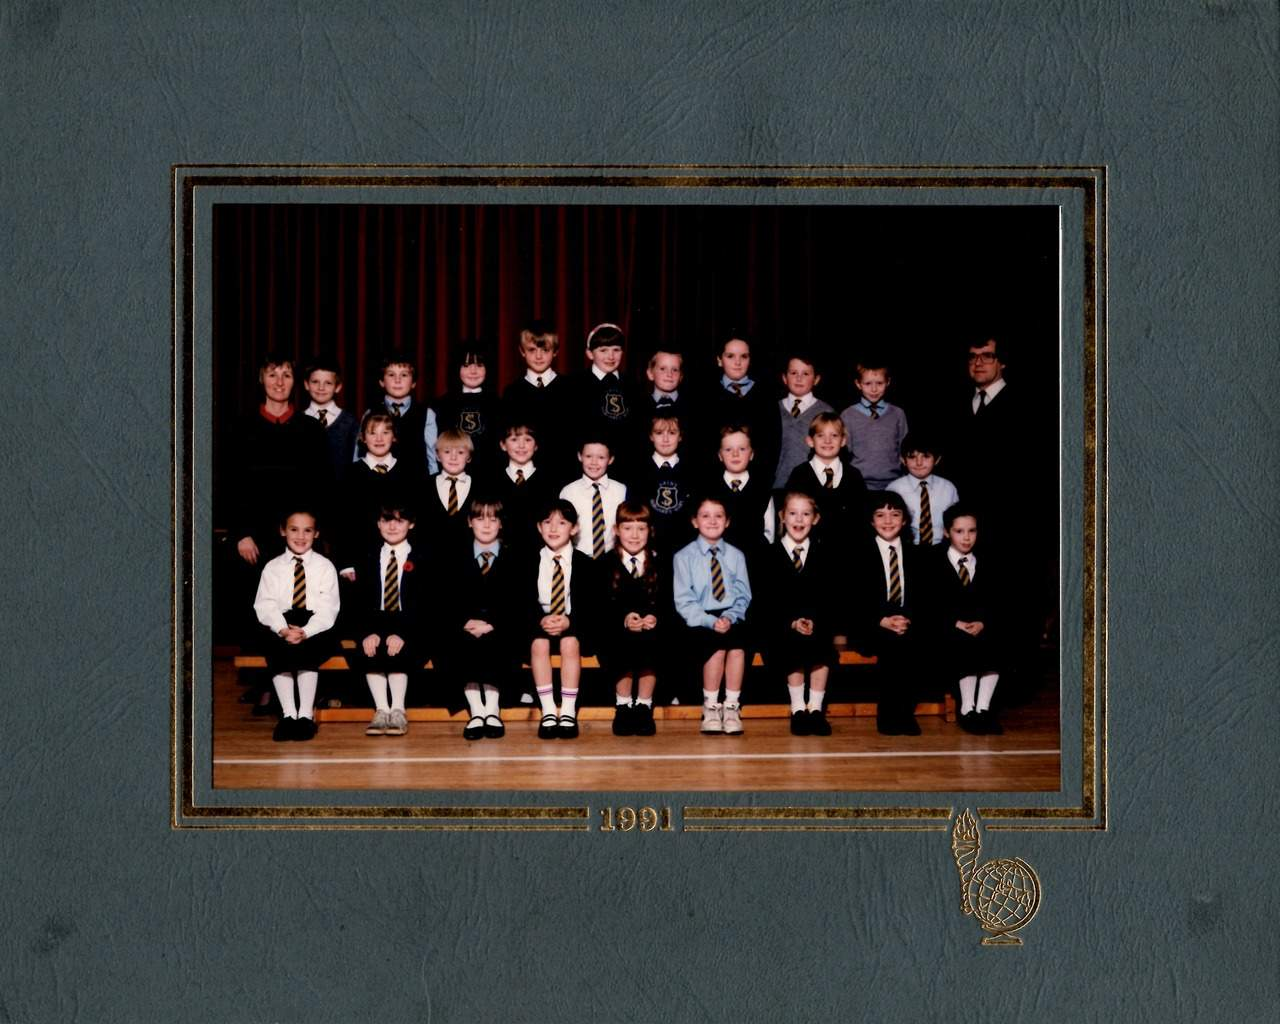 Sarah School Photo - 1991